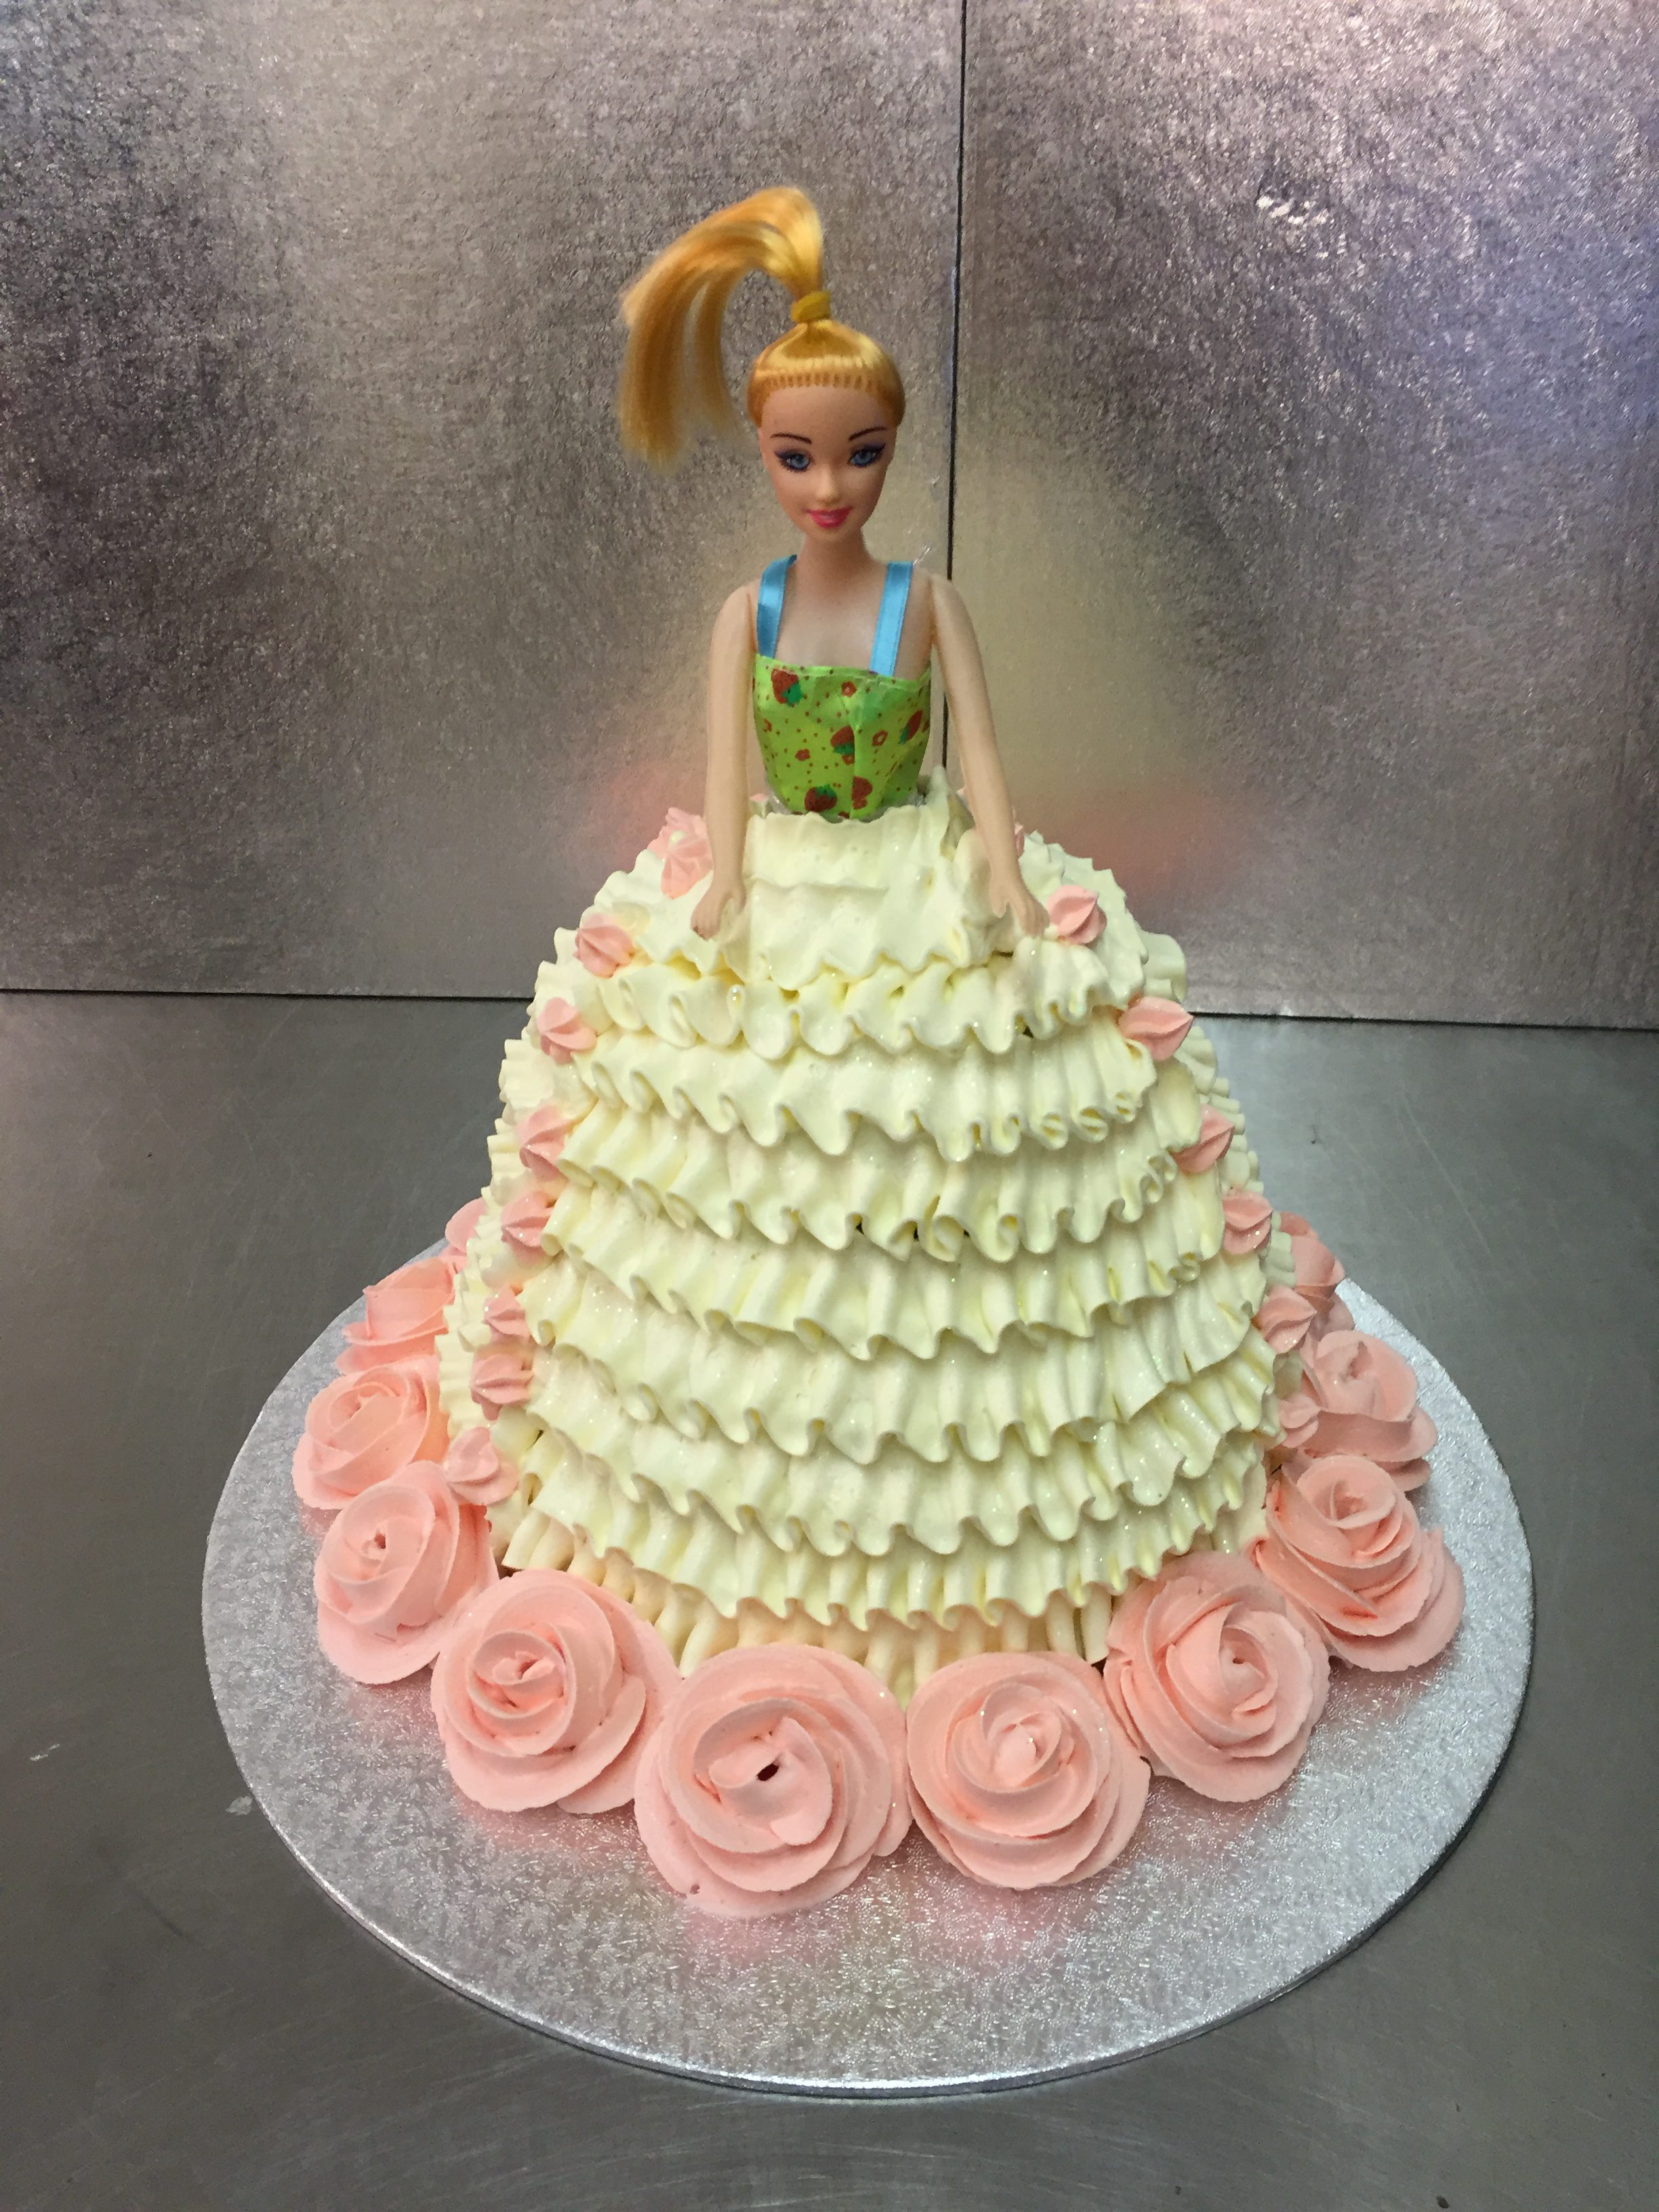 London Cake Show |